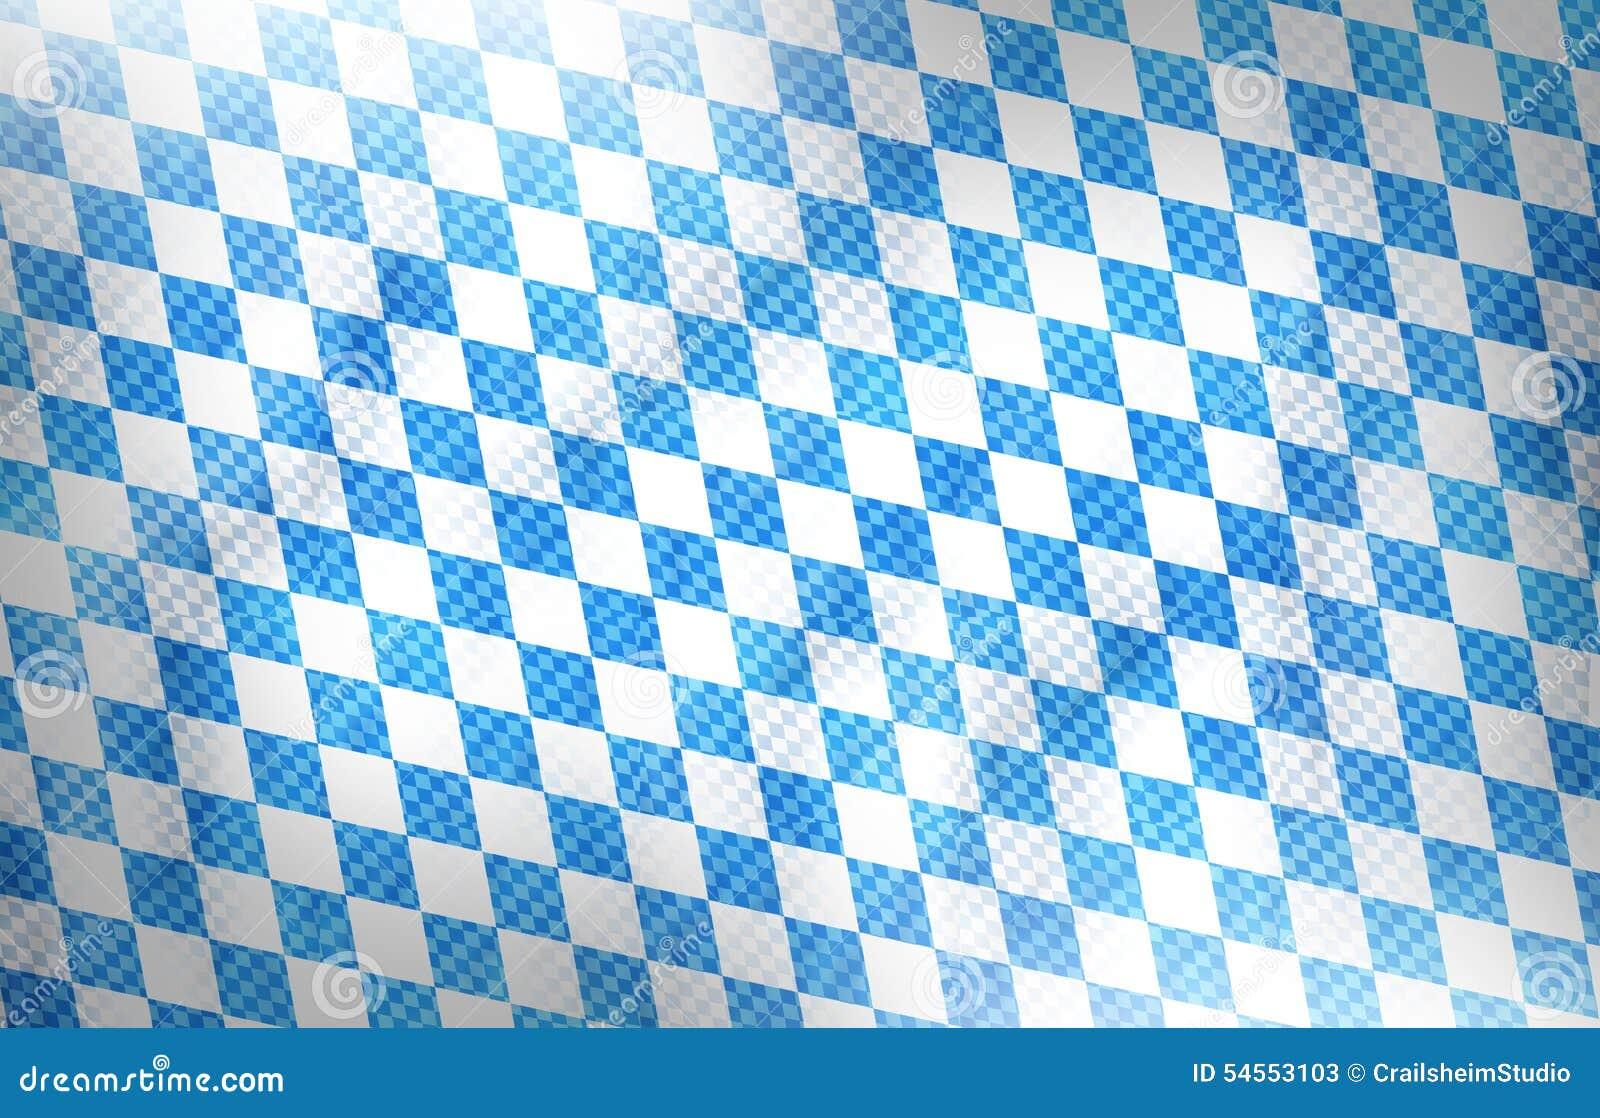 bayern oktoberfest hintergrund grafik stock abbildung bild 54553103. Black Bedroom Furniture Sets. Home Design Ideas